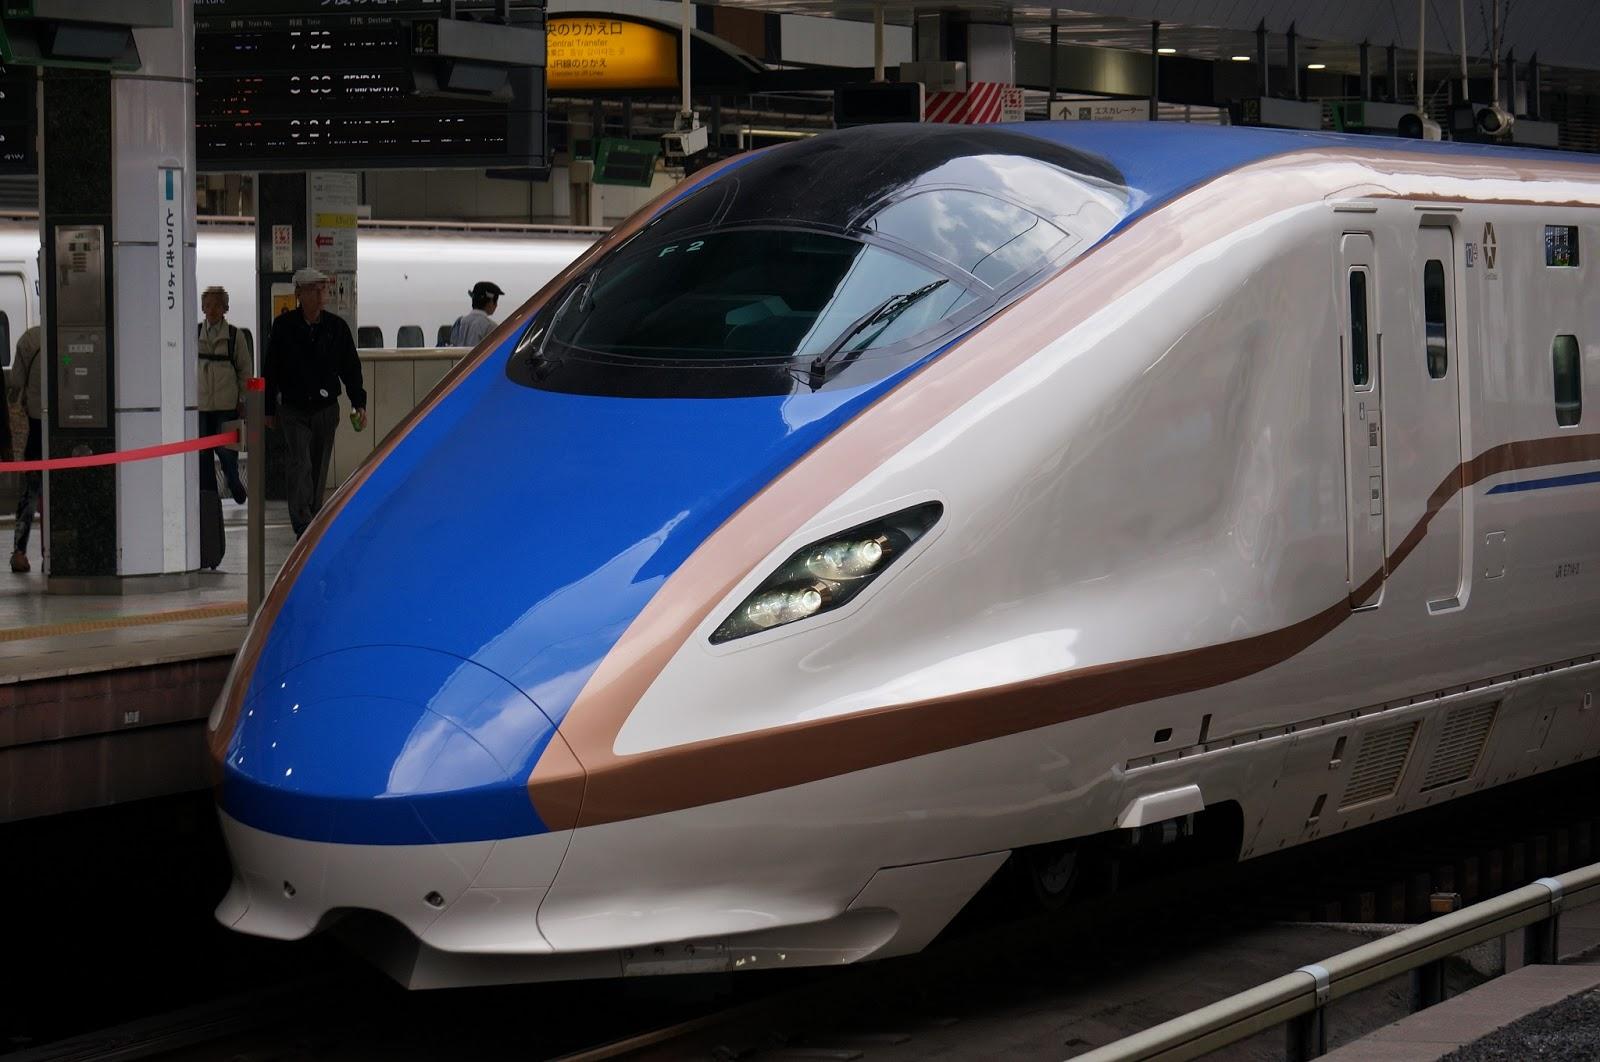 東京駅停車中のE7系新幹線